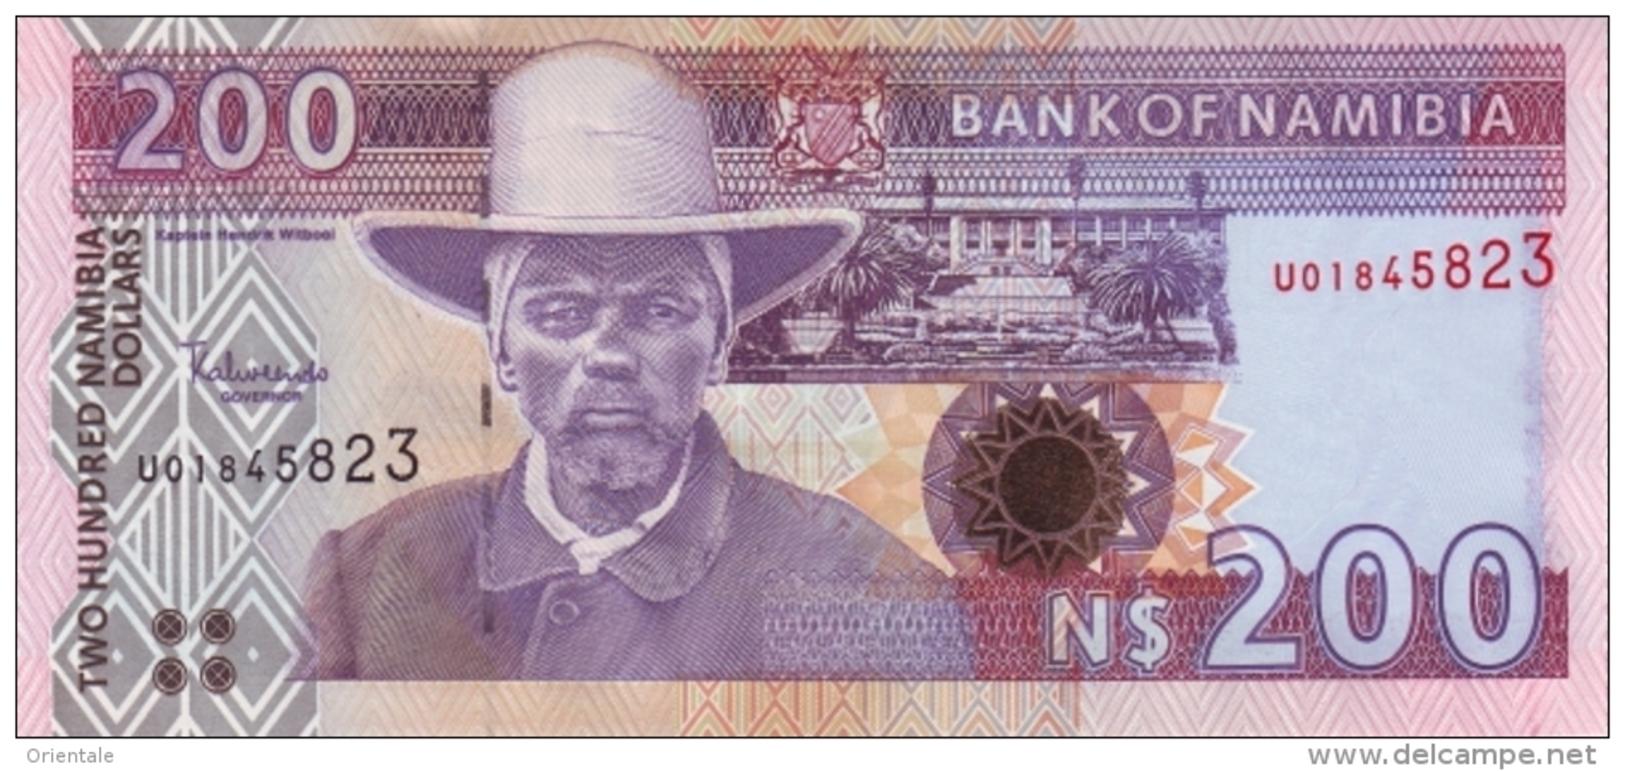 NAMIBIA P. 10b 200 D 1996 UNC - Namibia